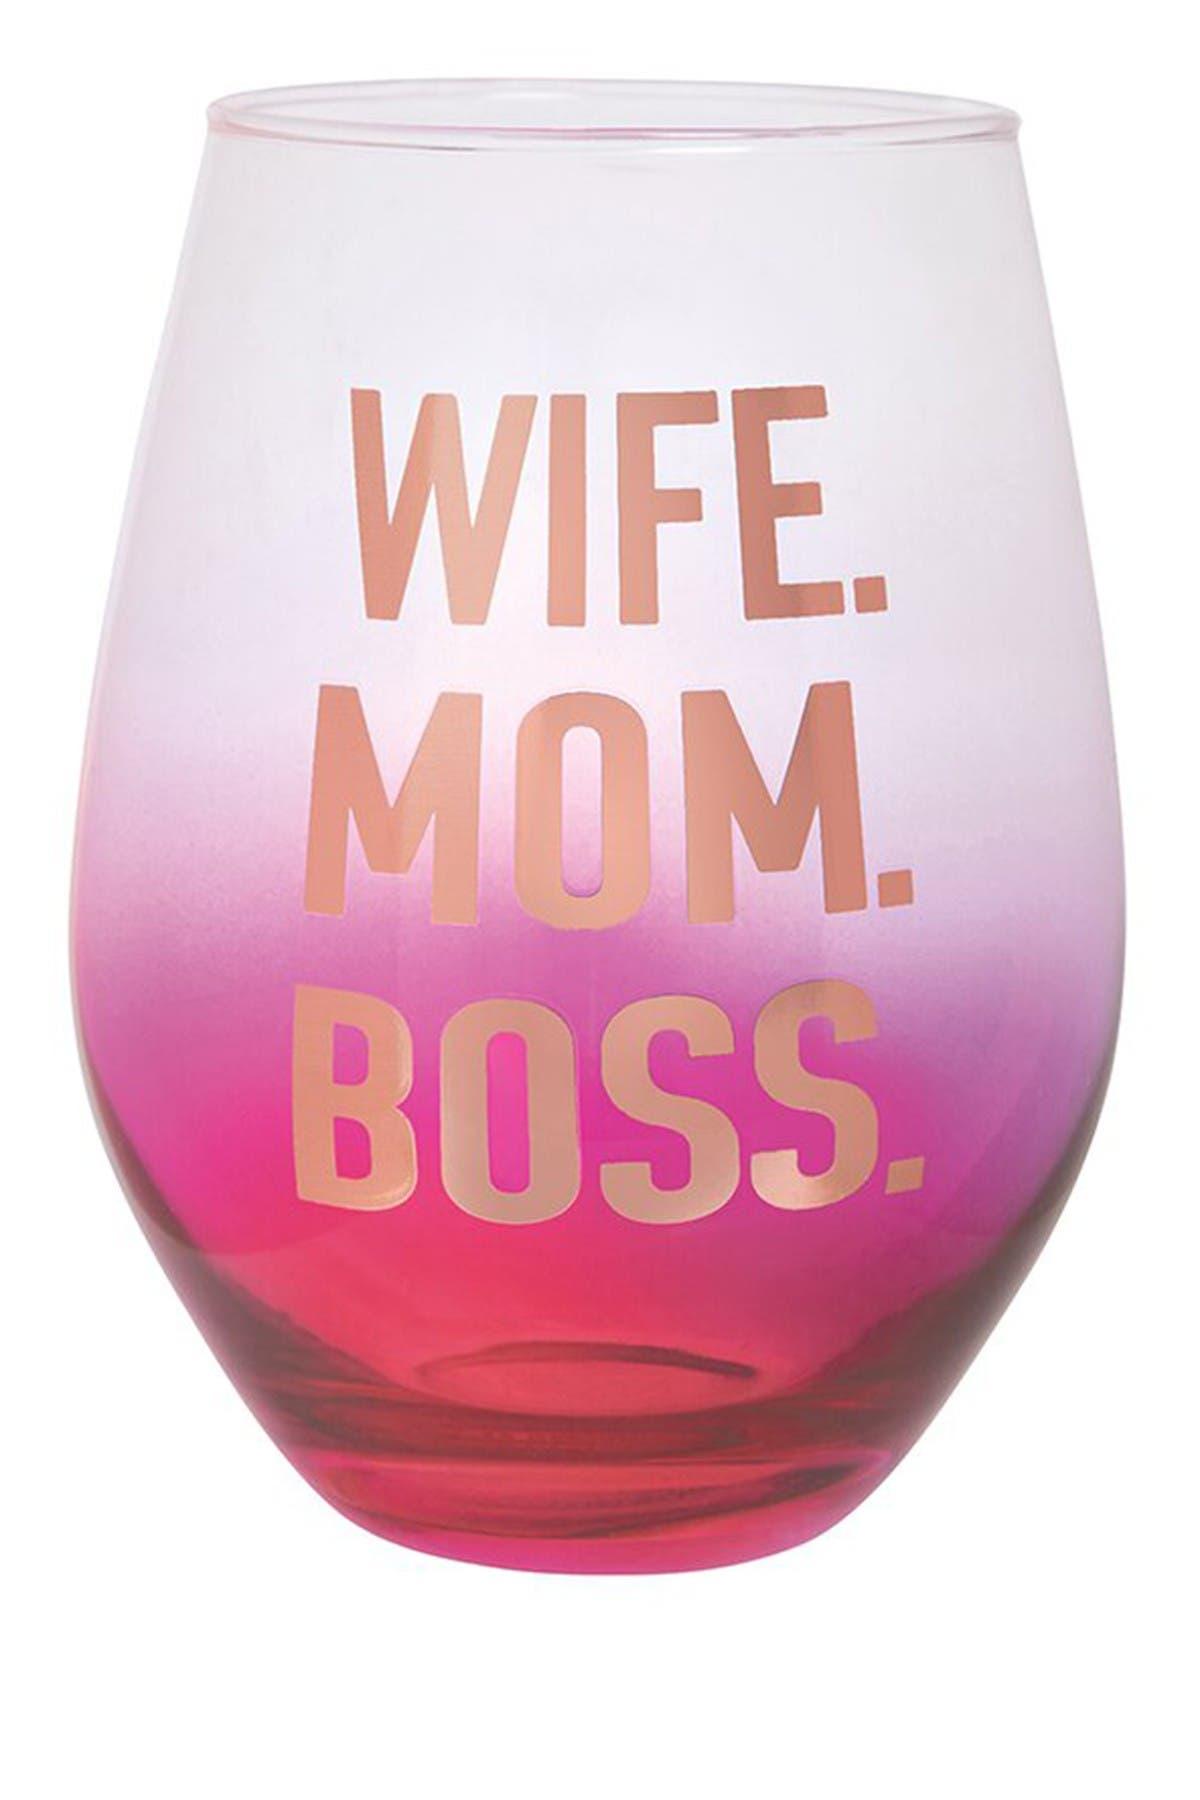 Image of SLANT COLLECTIONS Wife. Mom. Boss. Jumbo Stemless Novelty Wine Glass